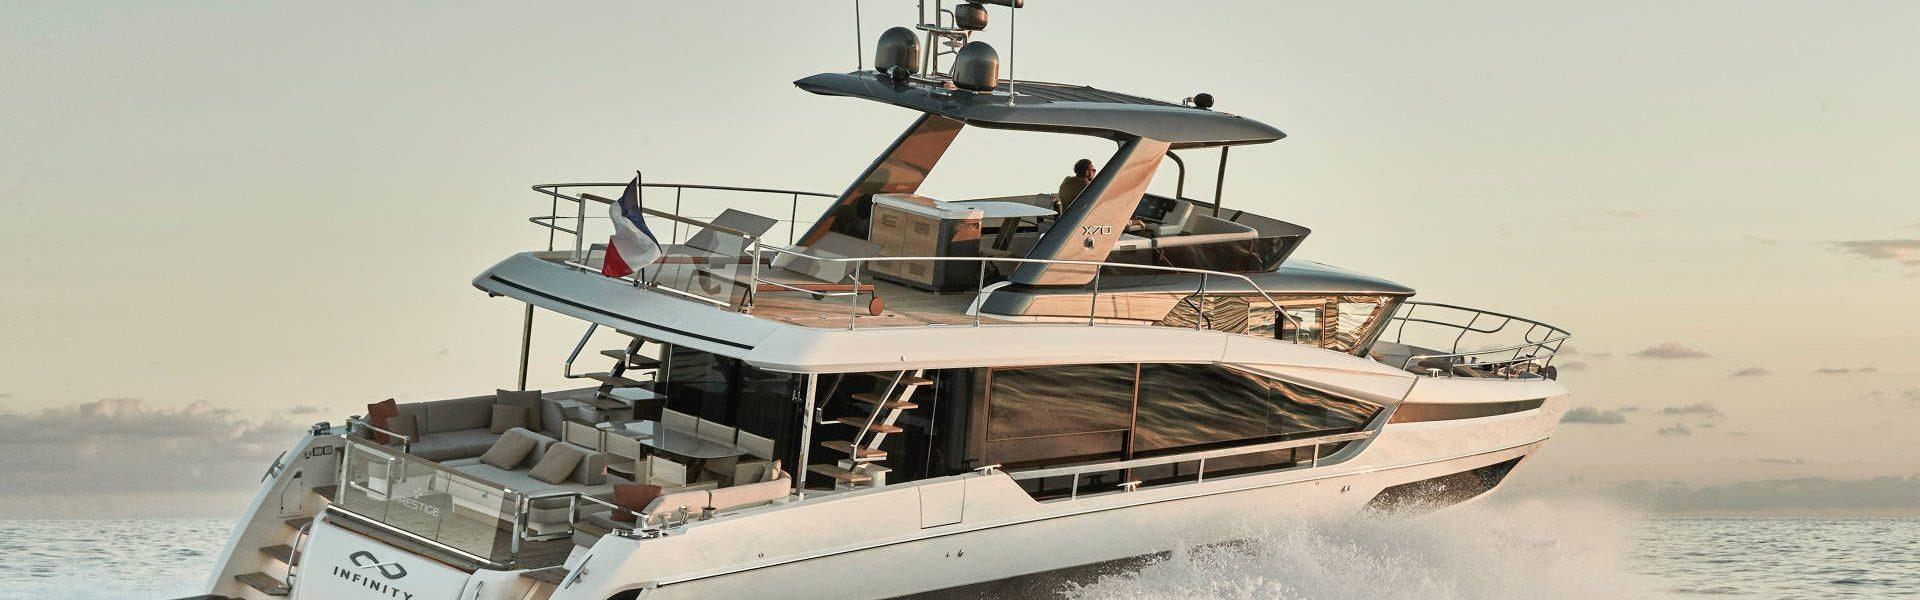 Яхты Prestige (Престиж, Франция)